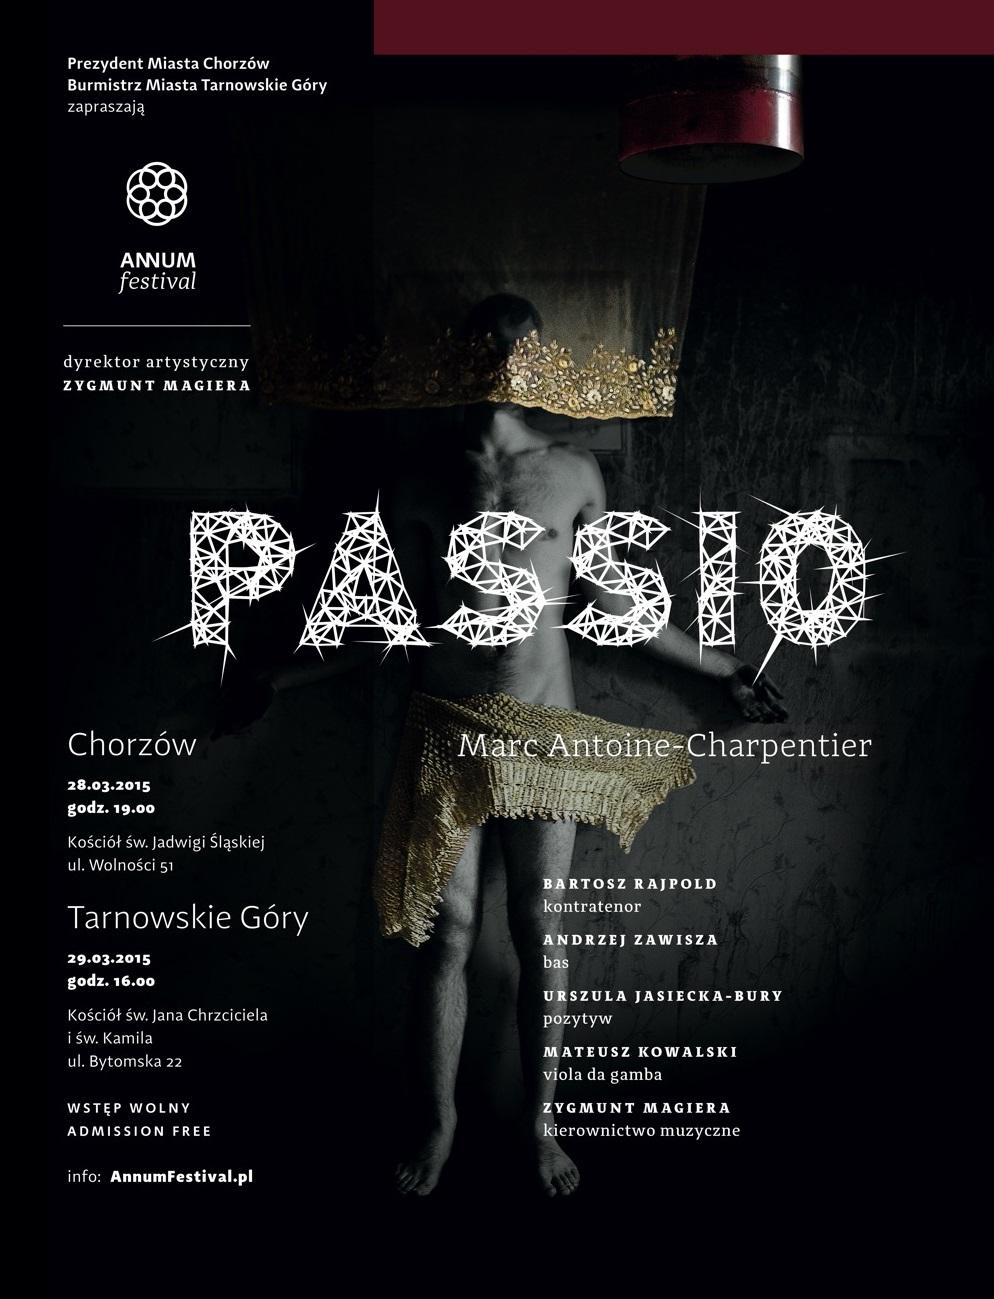 ANNUM Festival, plakat (źródło: materiały prasowe organizatora)